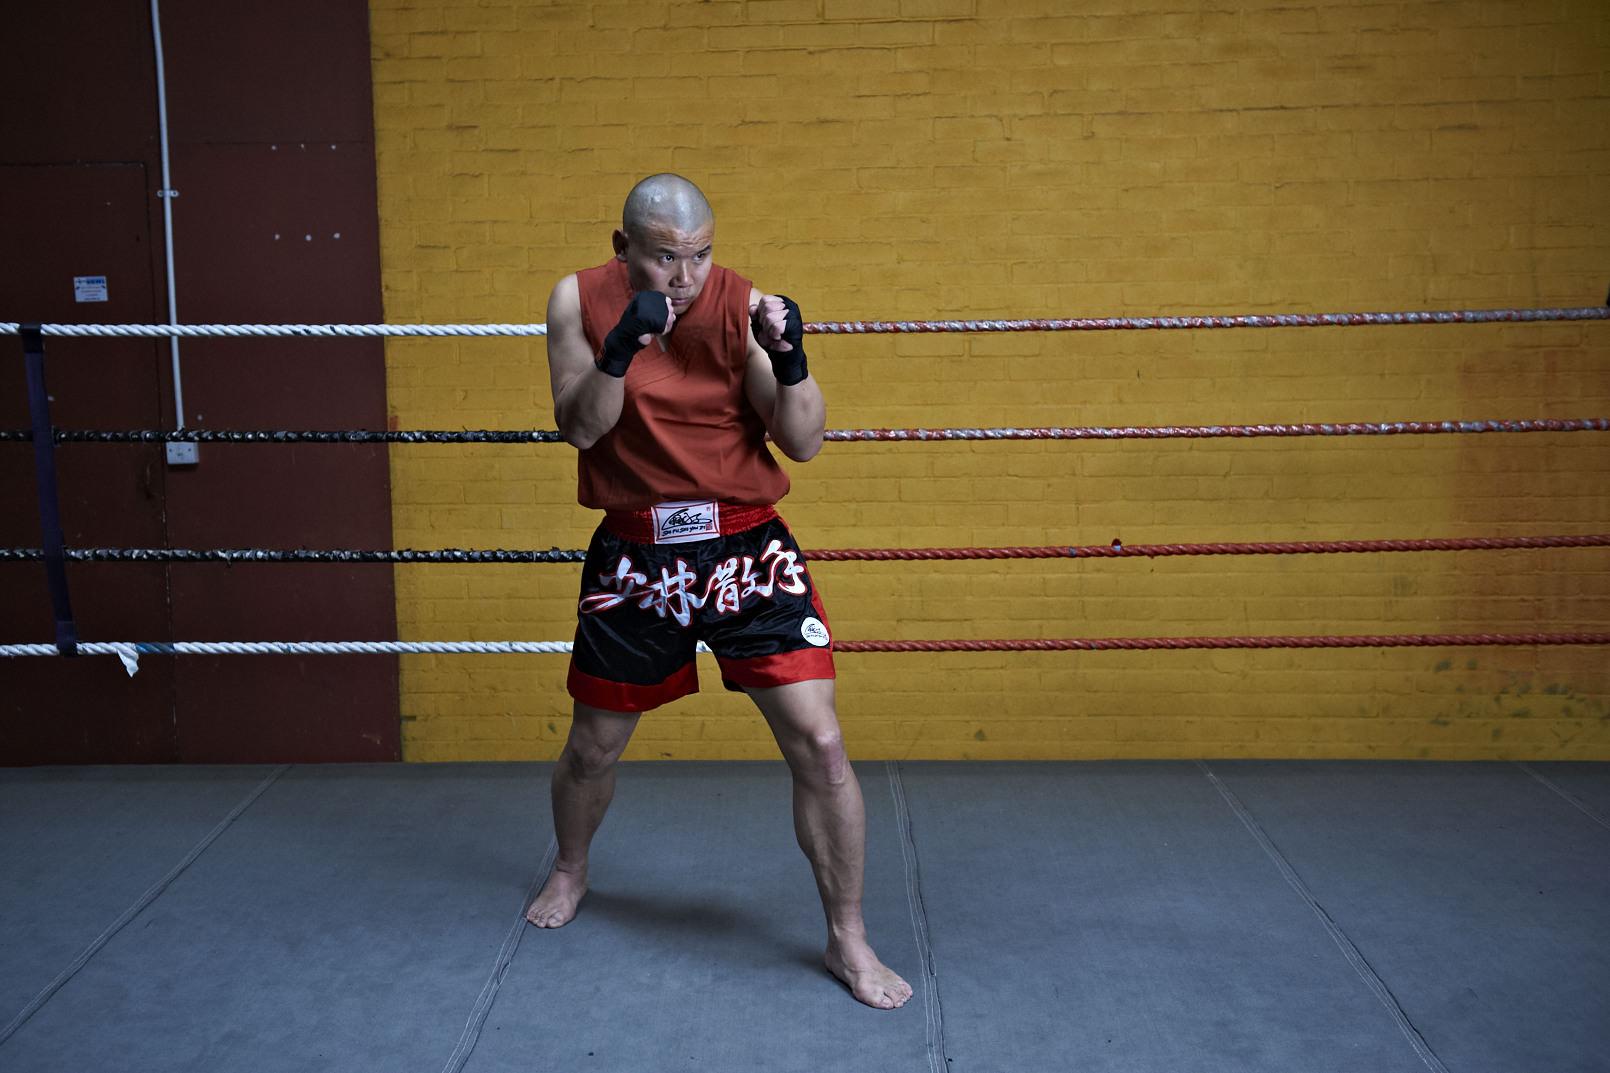 Shaolin temple uk shifu yanzi kick 27.jpg